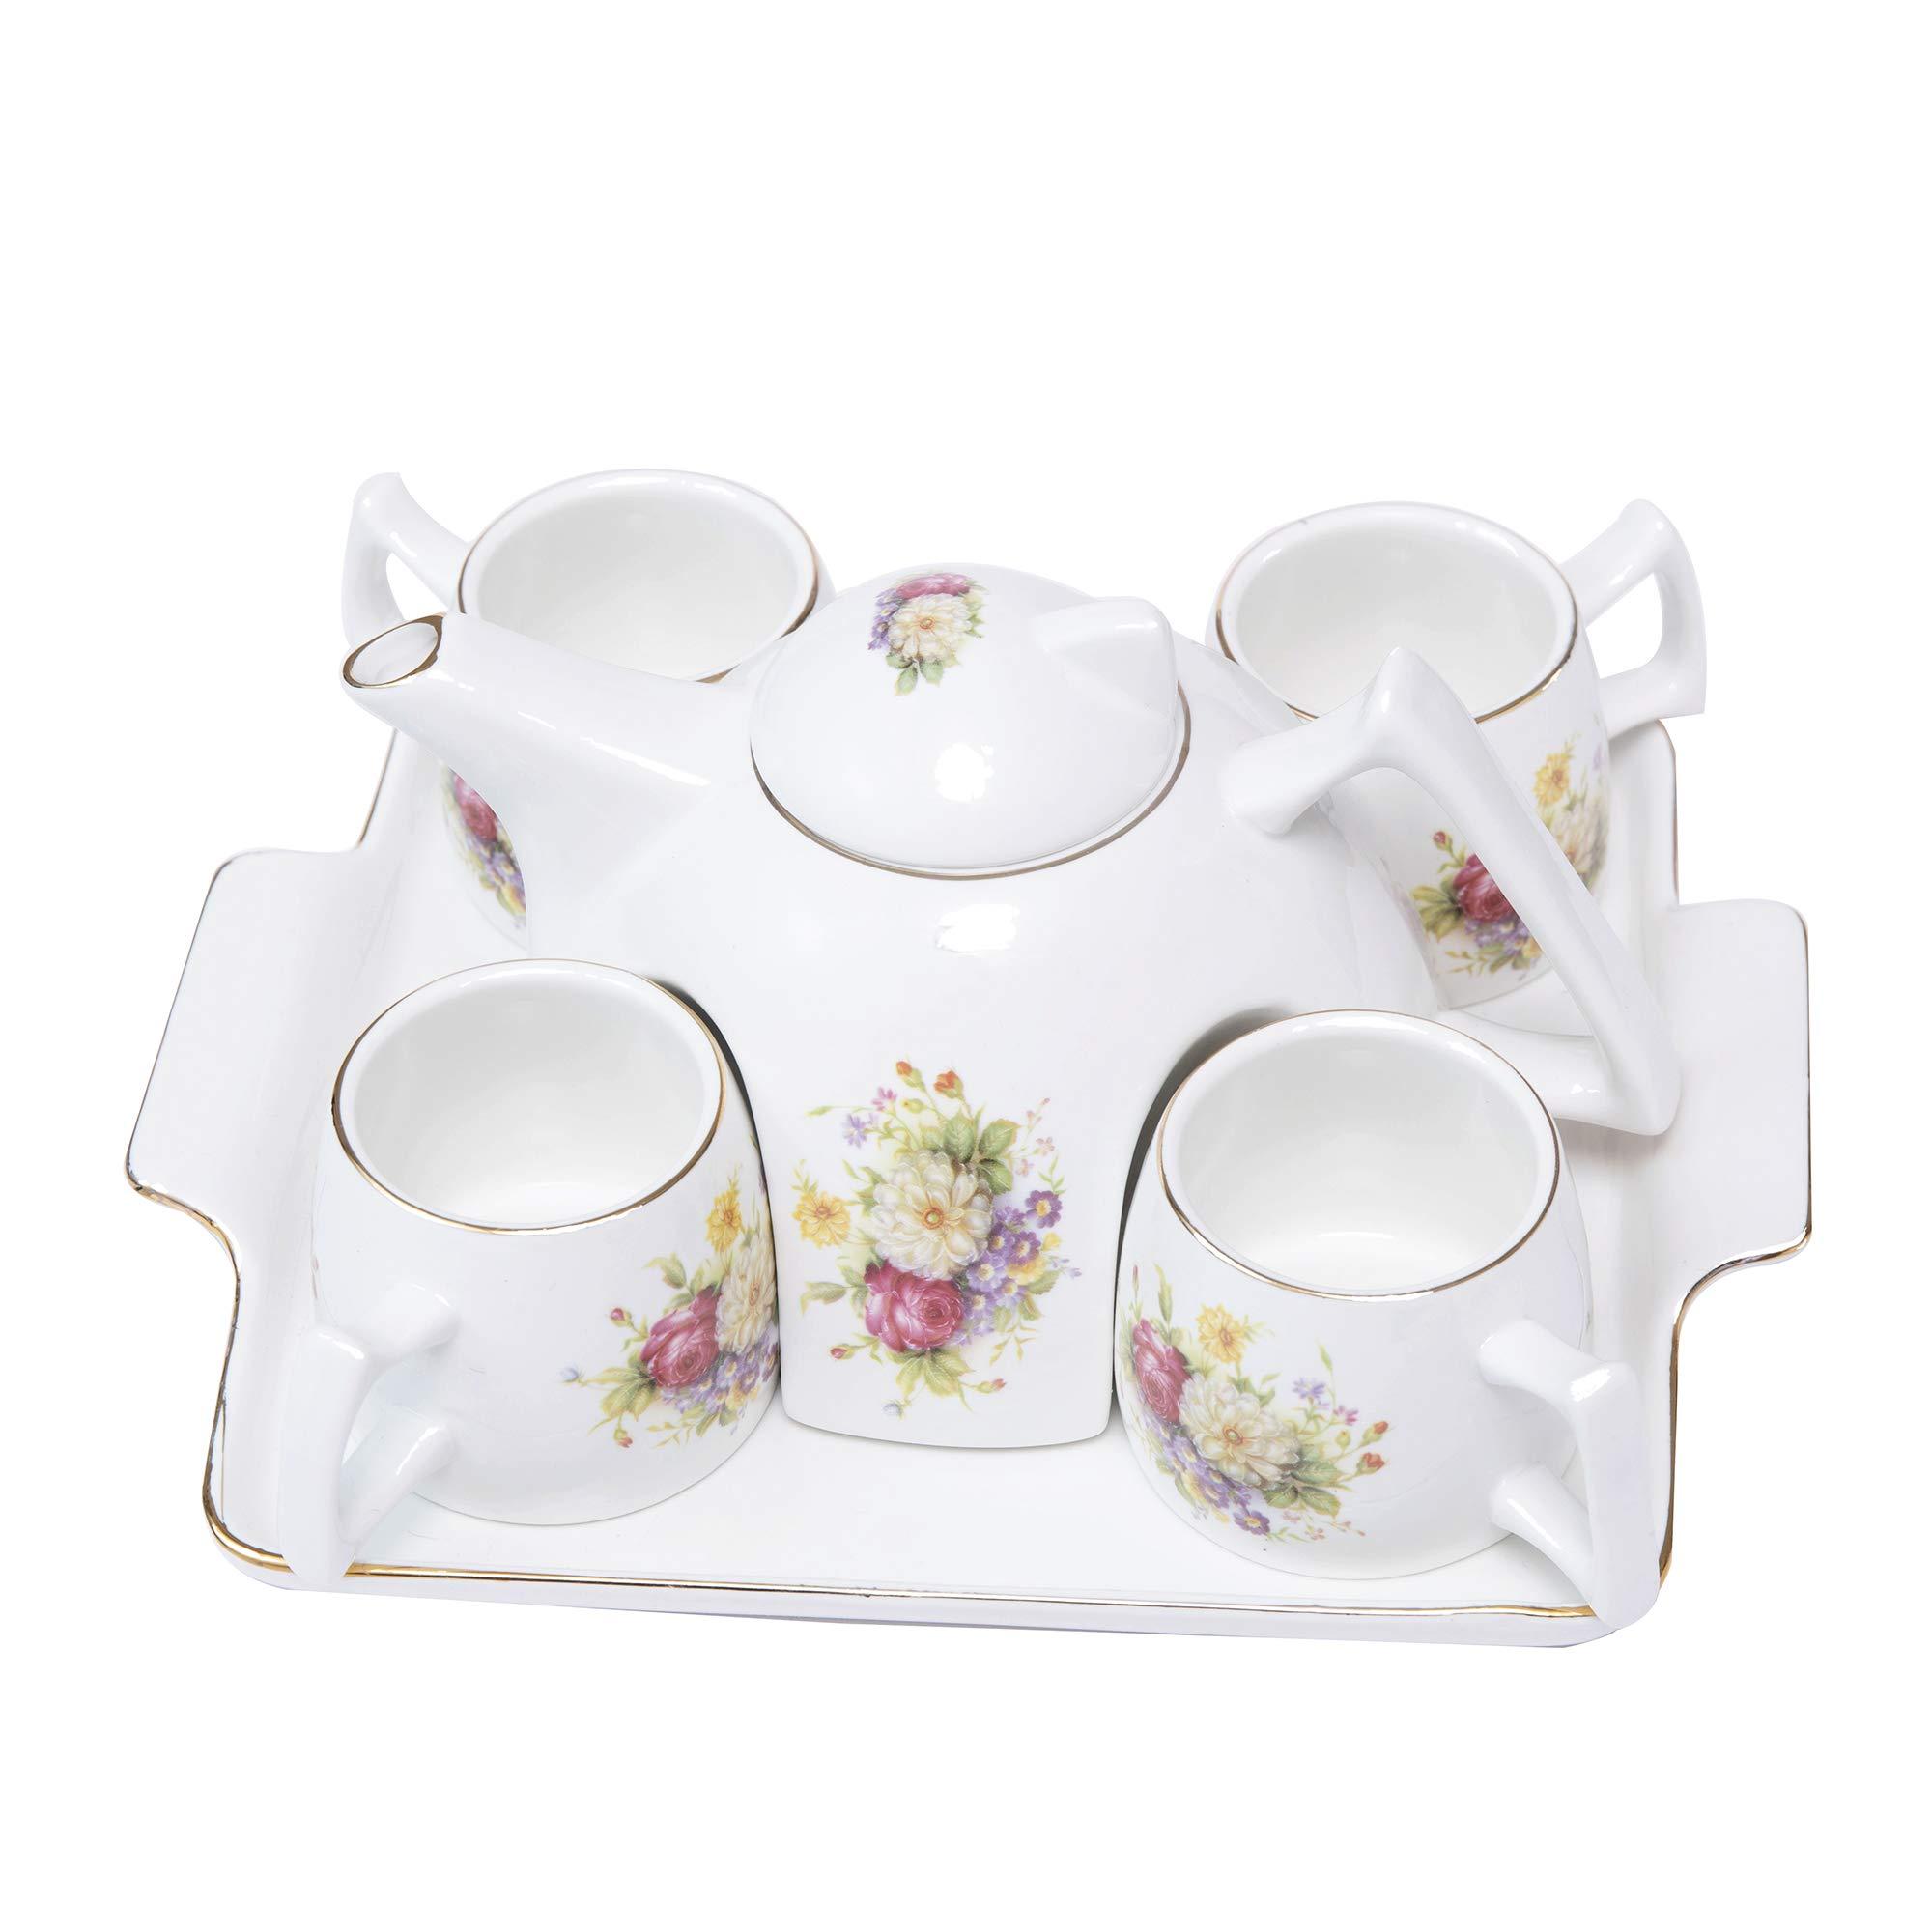 ufengke Flower Porcelain Coffee Tea Set,One Piece Large Tea Pot,4 Coffee Cups with Tray